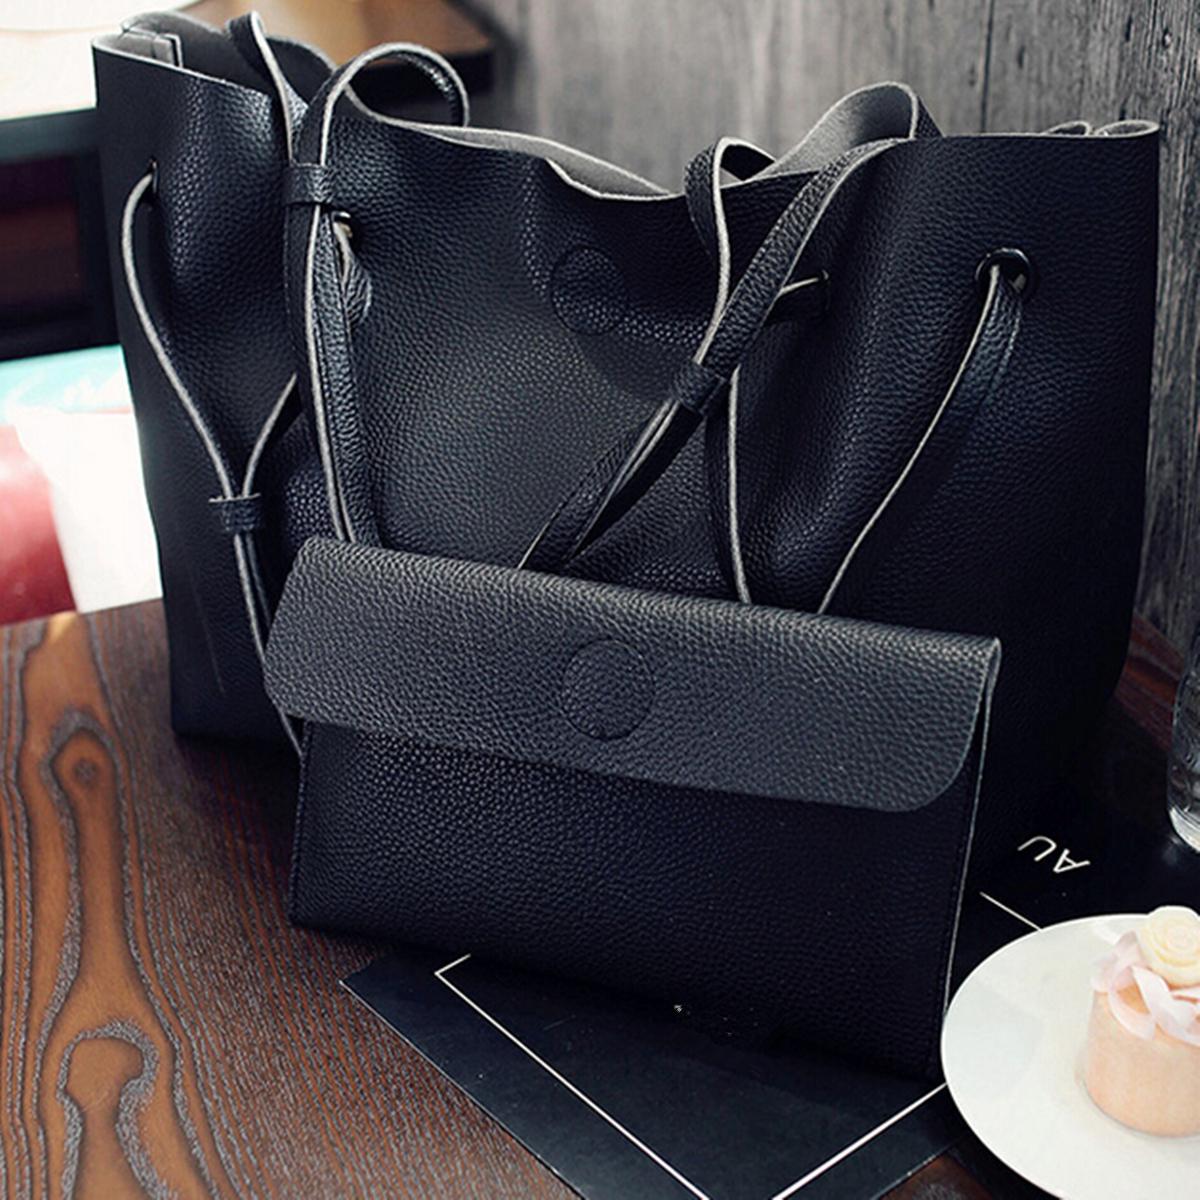 2Pcs-Women-Ladies-Leather-Shoulder-Messenge-Bag-Tote-Purse-Handbag-Crossbody-AU